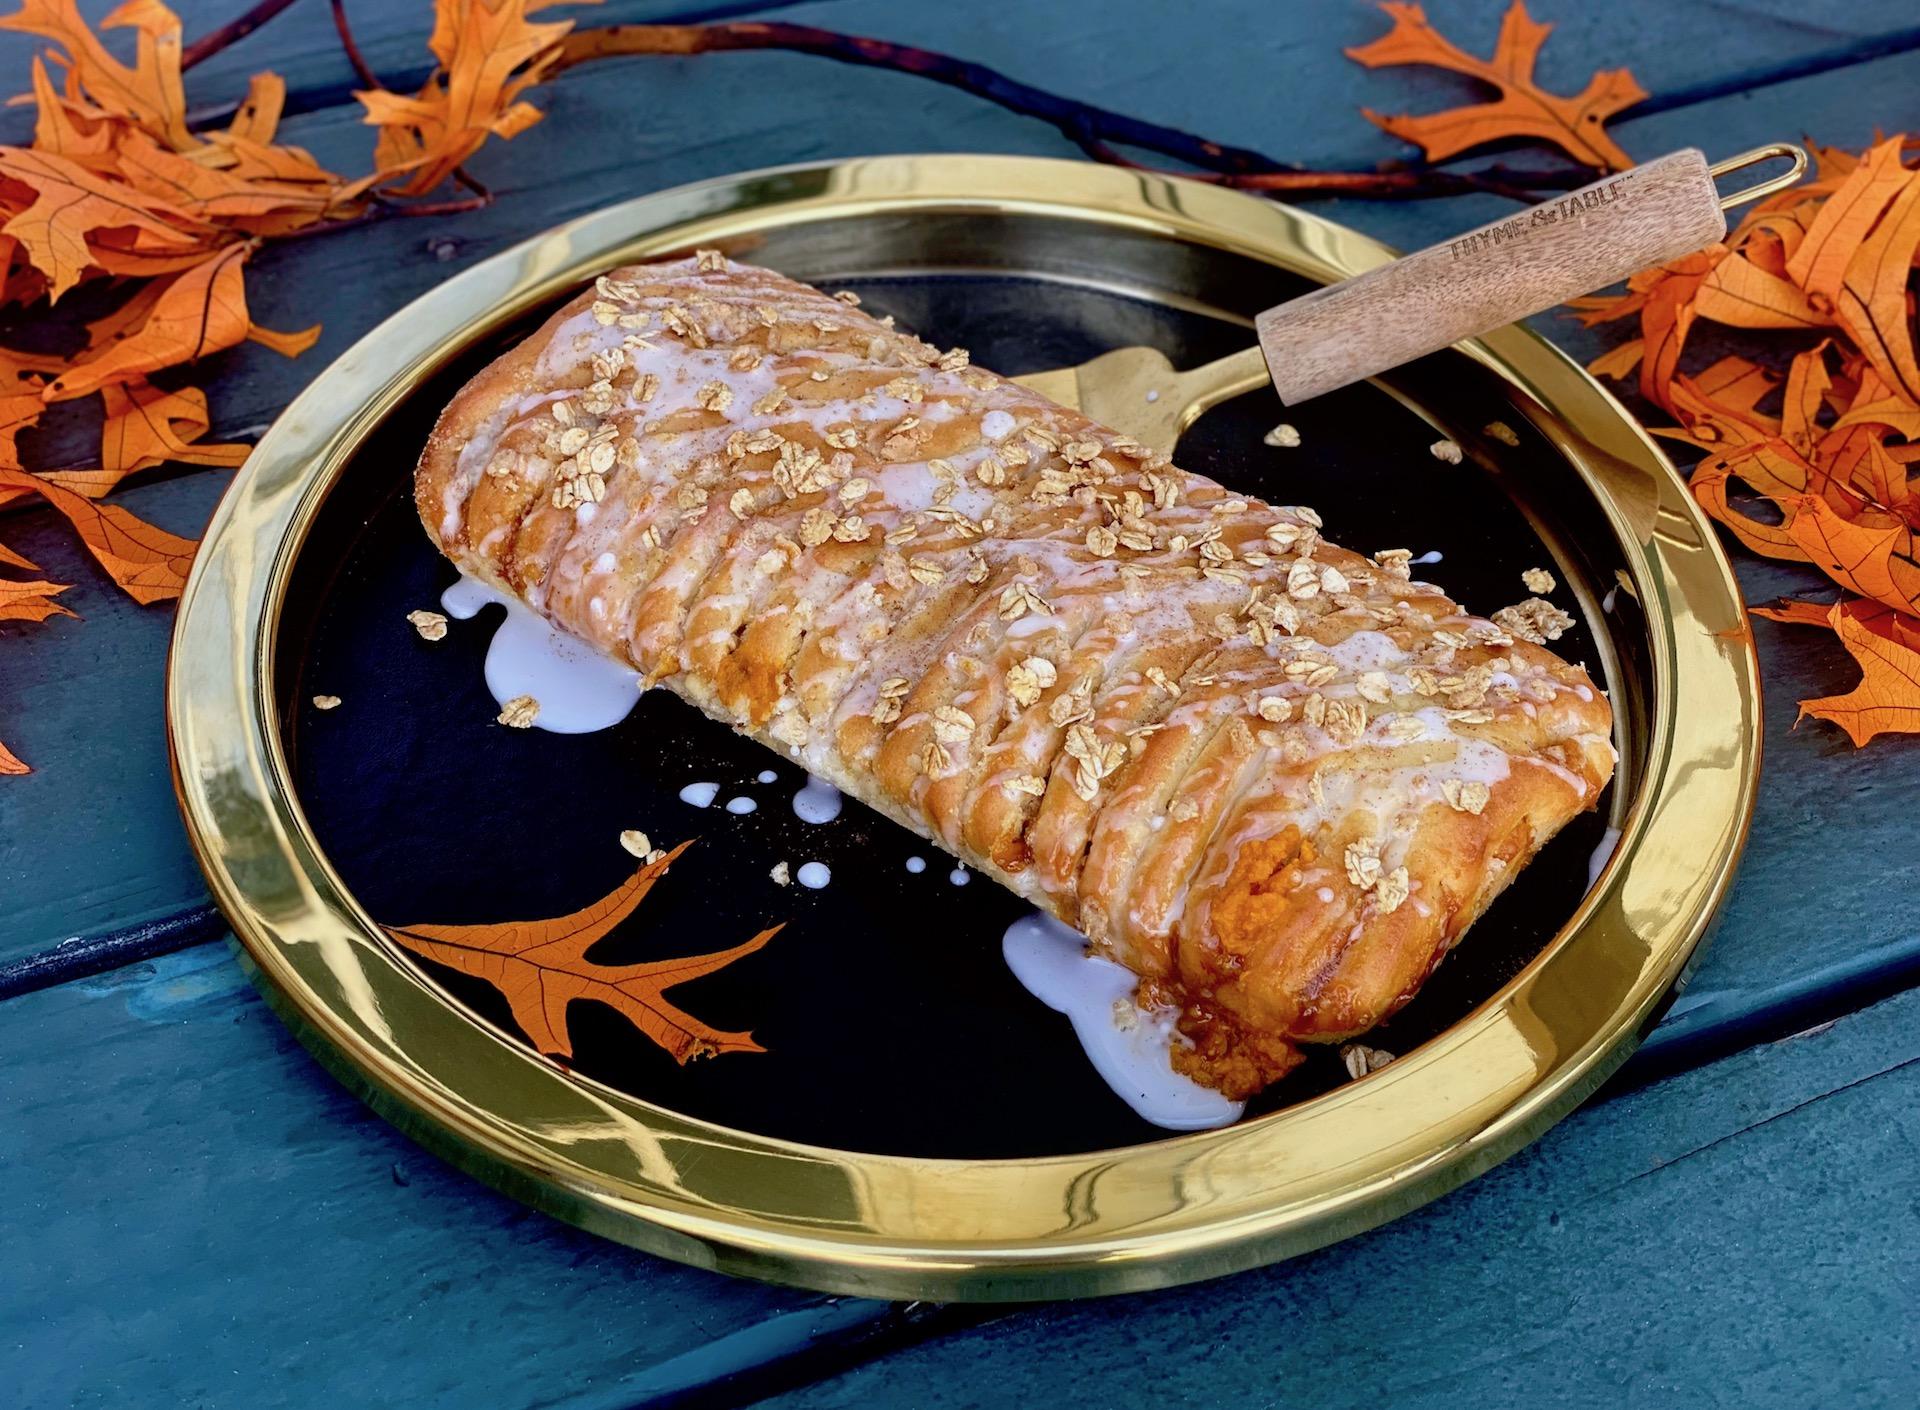 Pumpkin Brioche Braided Breakfast (Danish) Bread